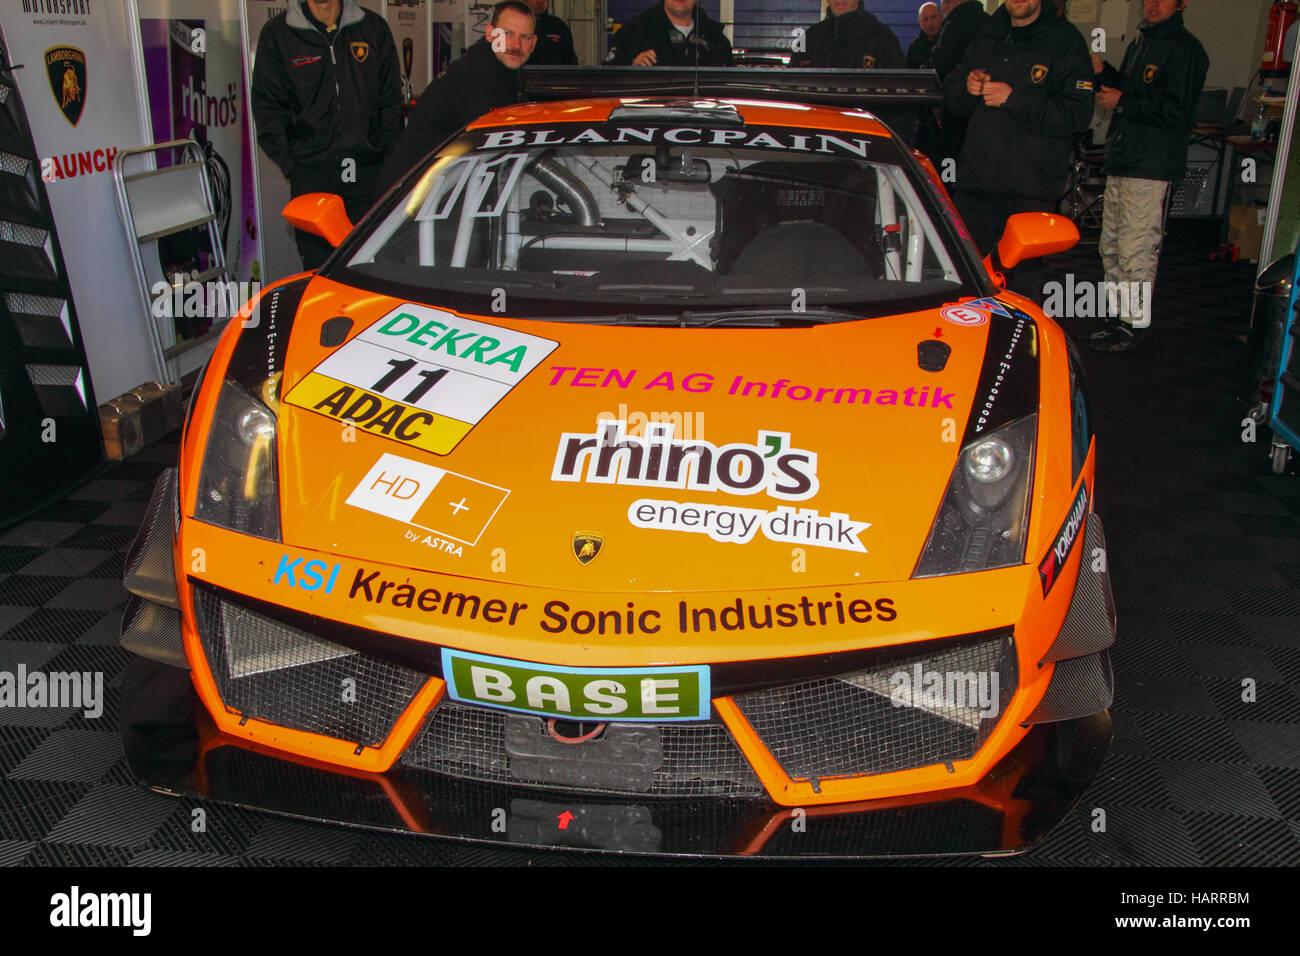 Lamborghini Gallardo in the box at ADAC GT Masters motorsport event - Stock Image